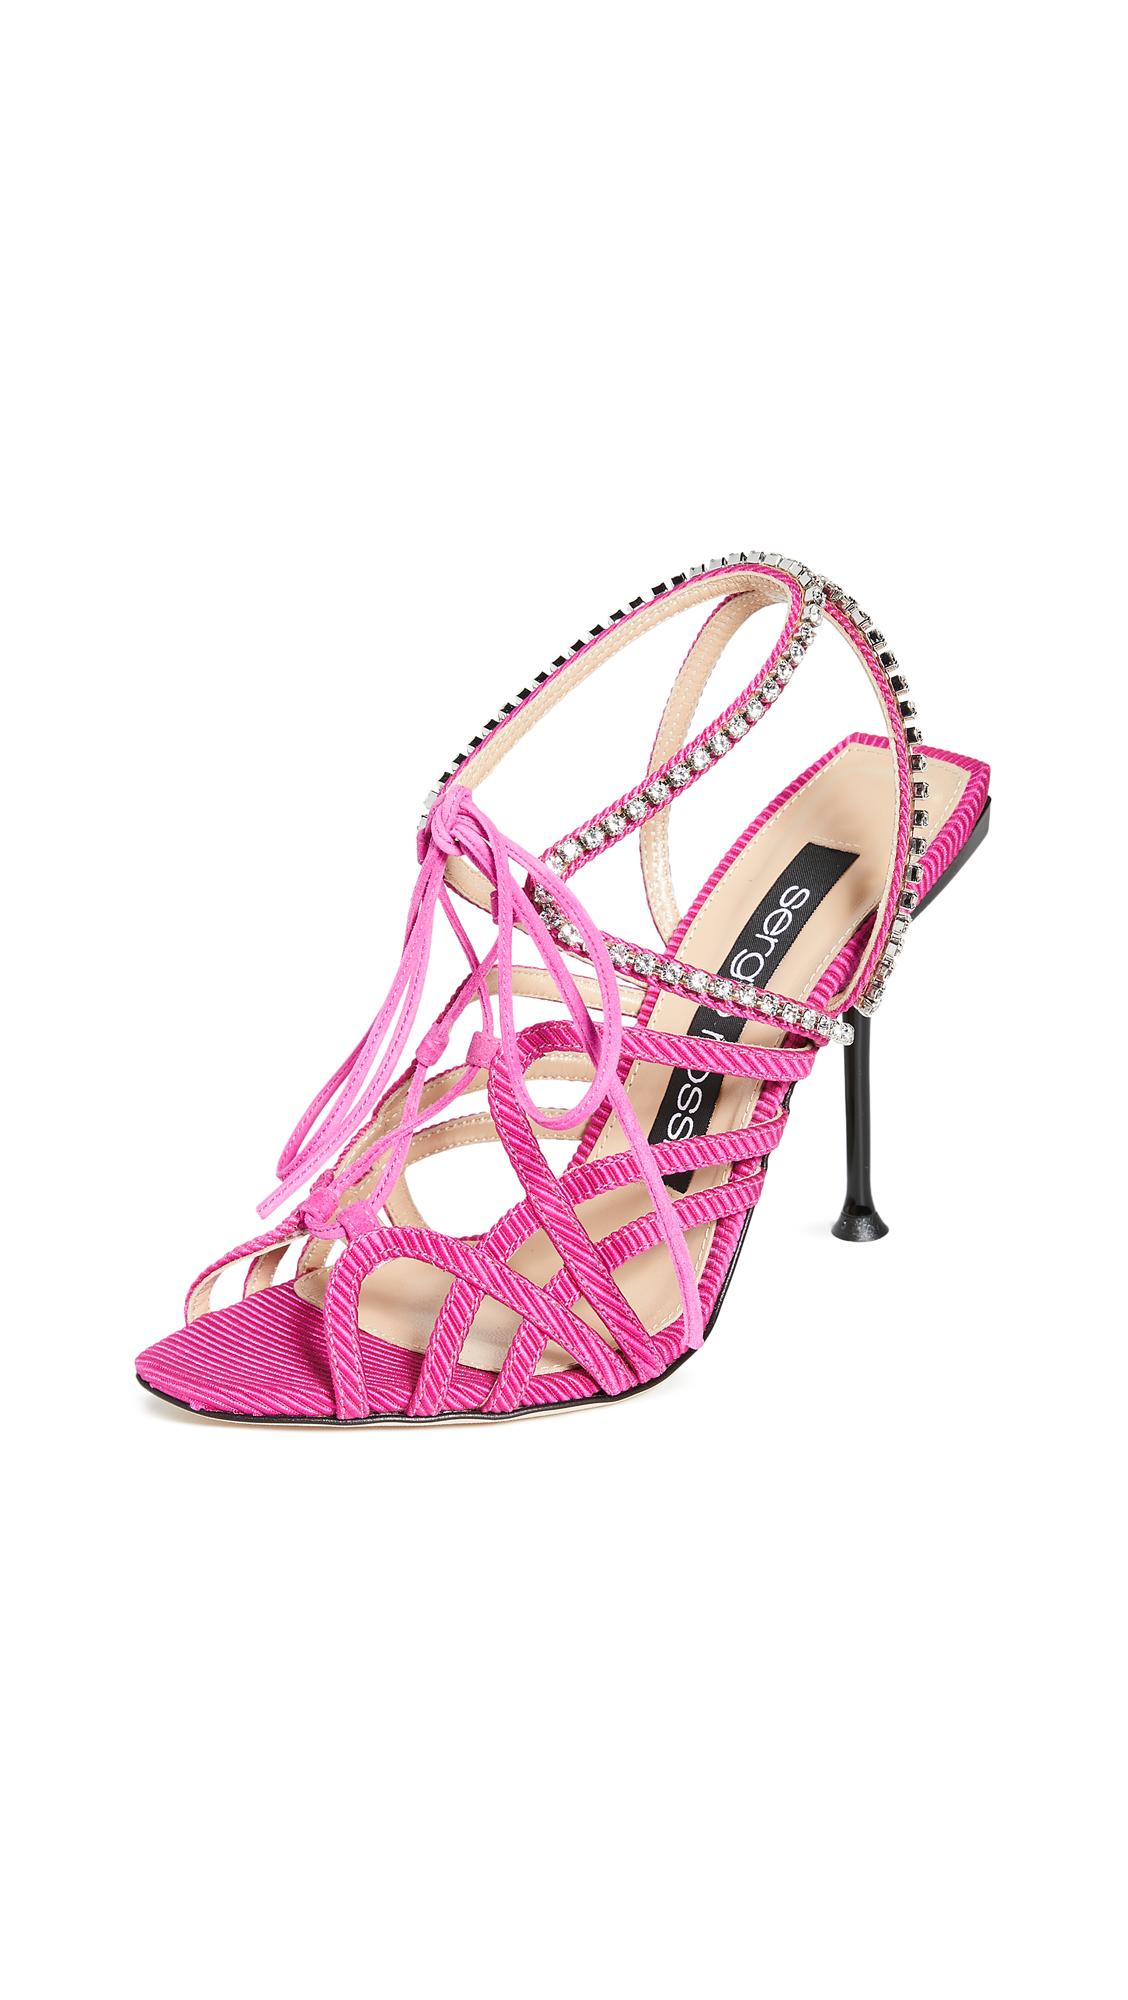 Buy Sergio Rossi Sr Milano Sandals online, shop Sergio Rossi